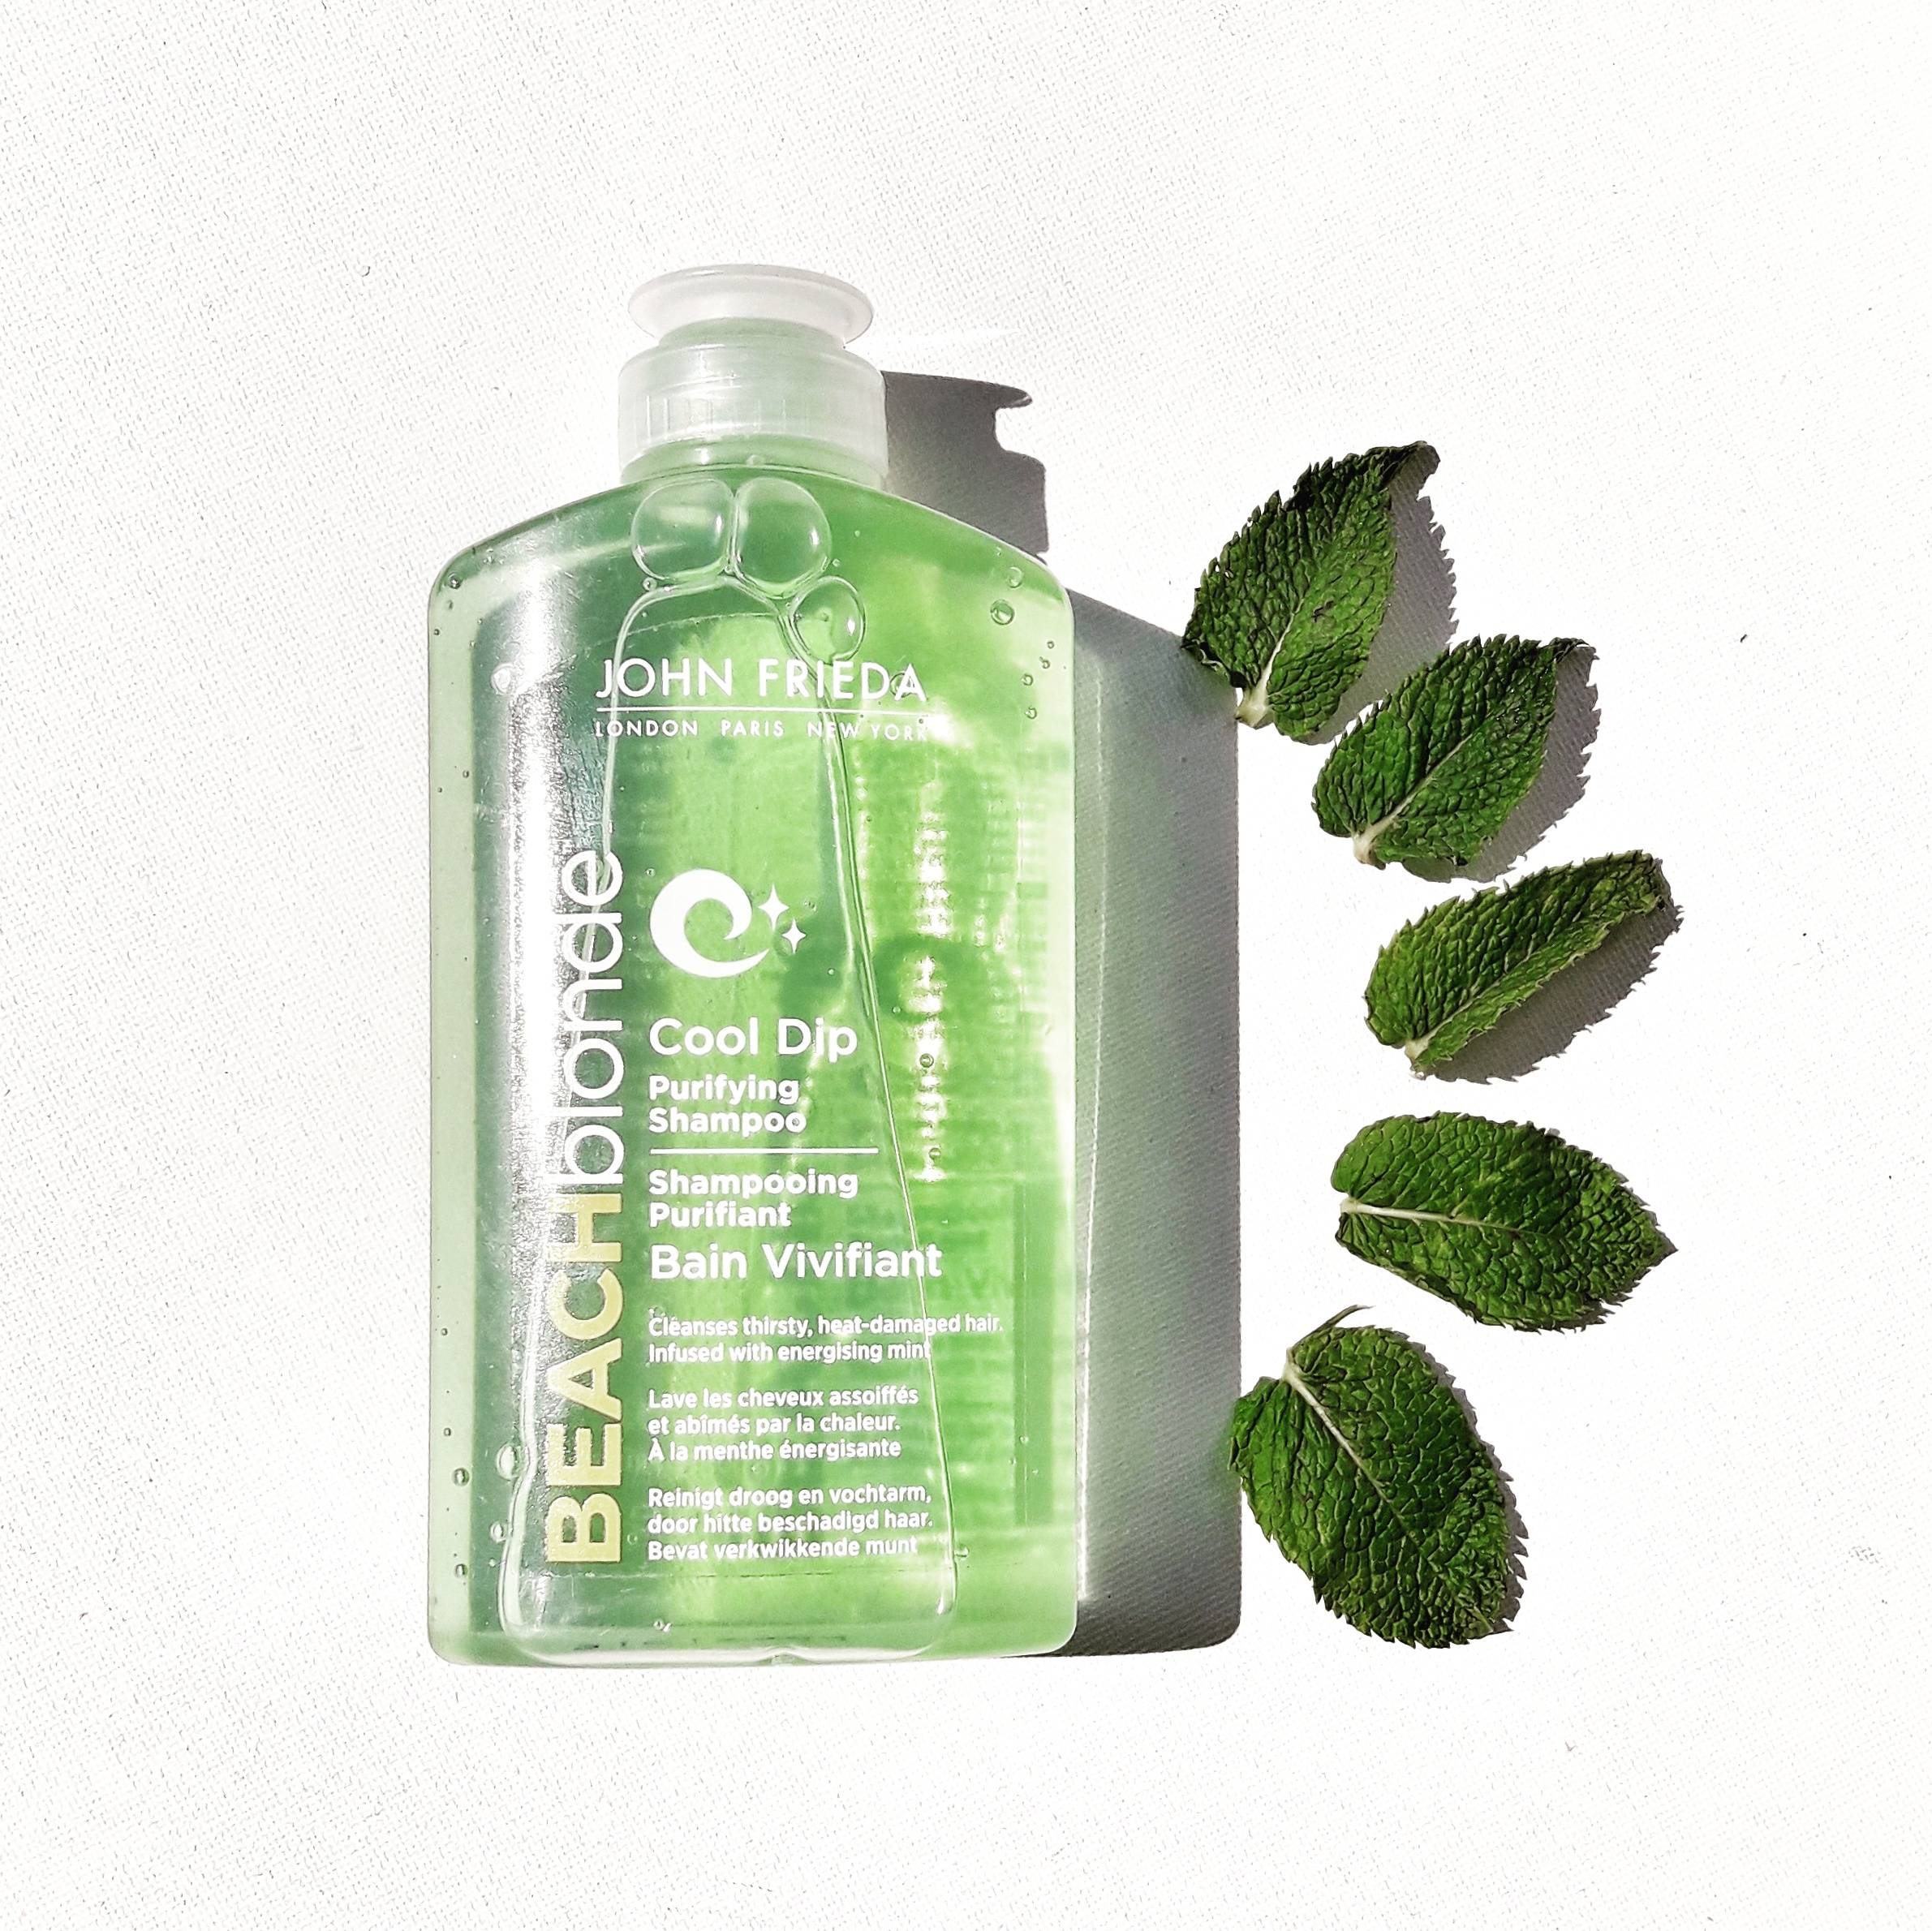 Le Shampoing Purifiant Bain Vivifiant de John Frieda. 6.90€* - 250ml. En vente chez Monoprix